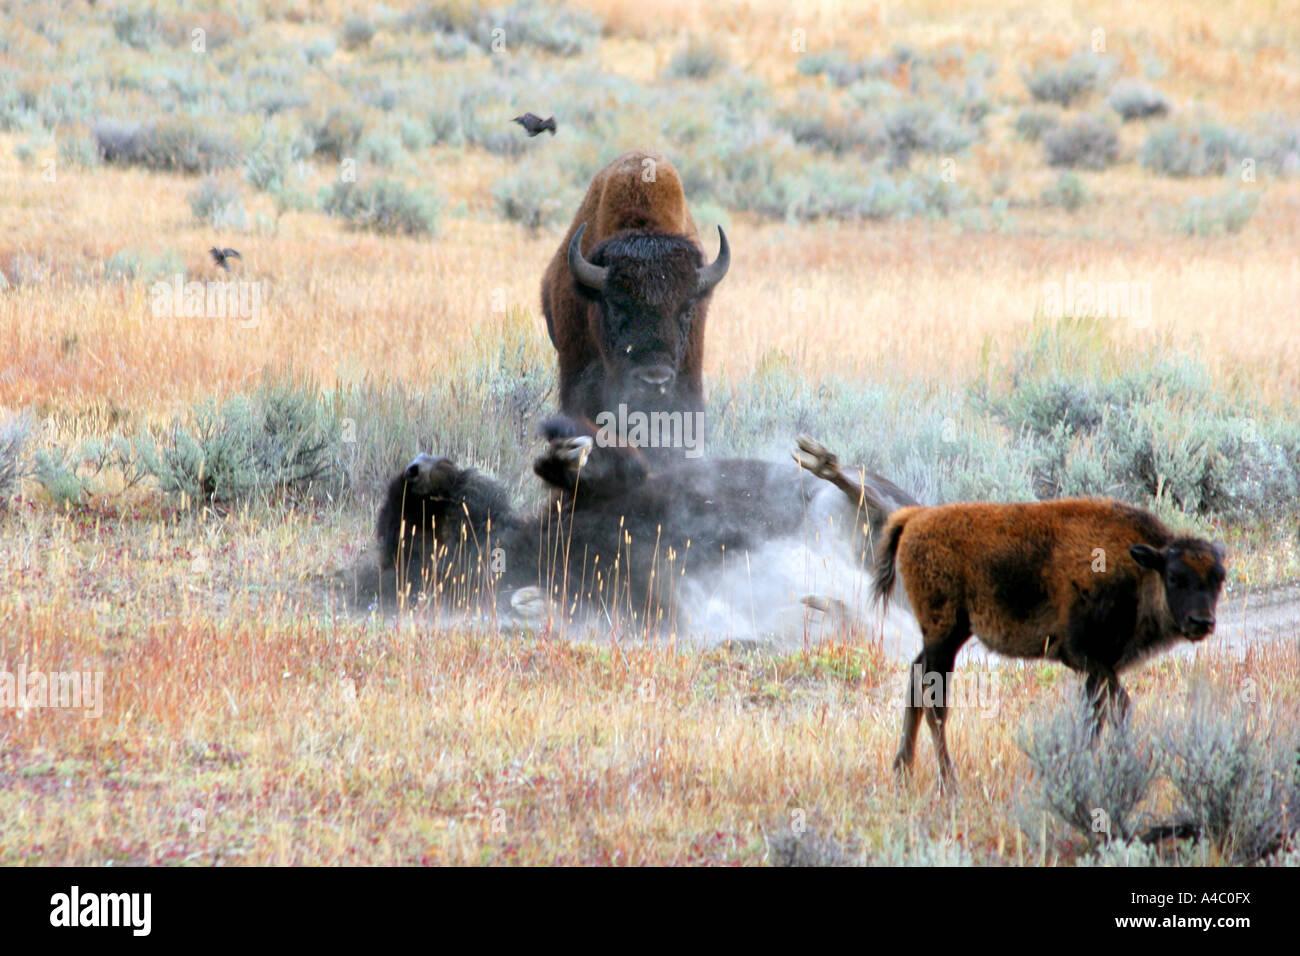 Bison unter Staub Bad, Lamar Valley, Yellowstone-Nationalpark, wyoming Stockfoto